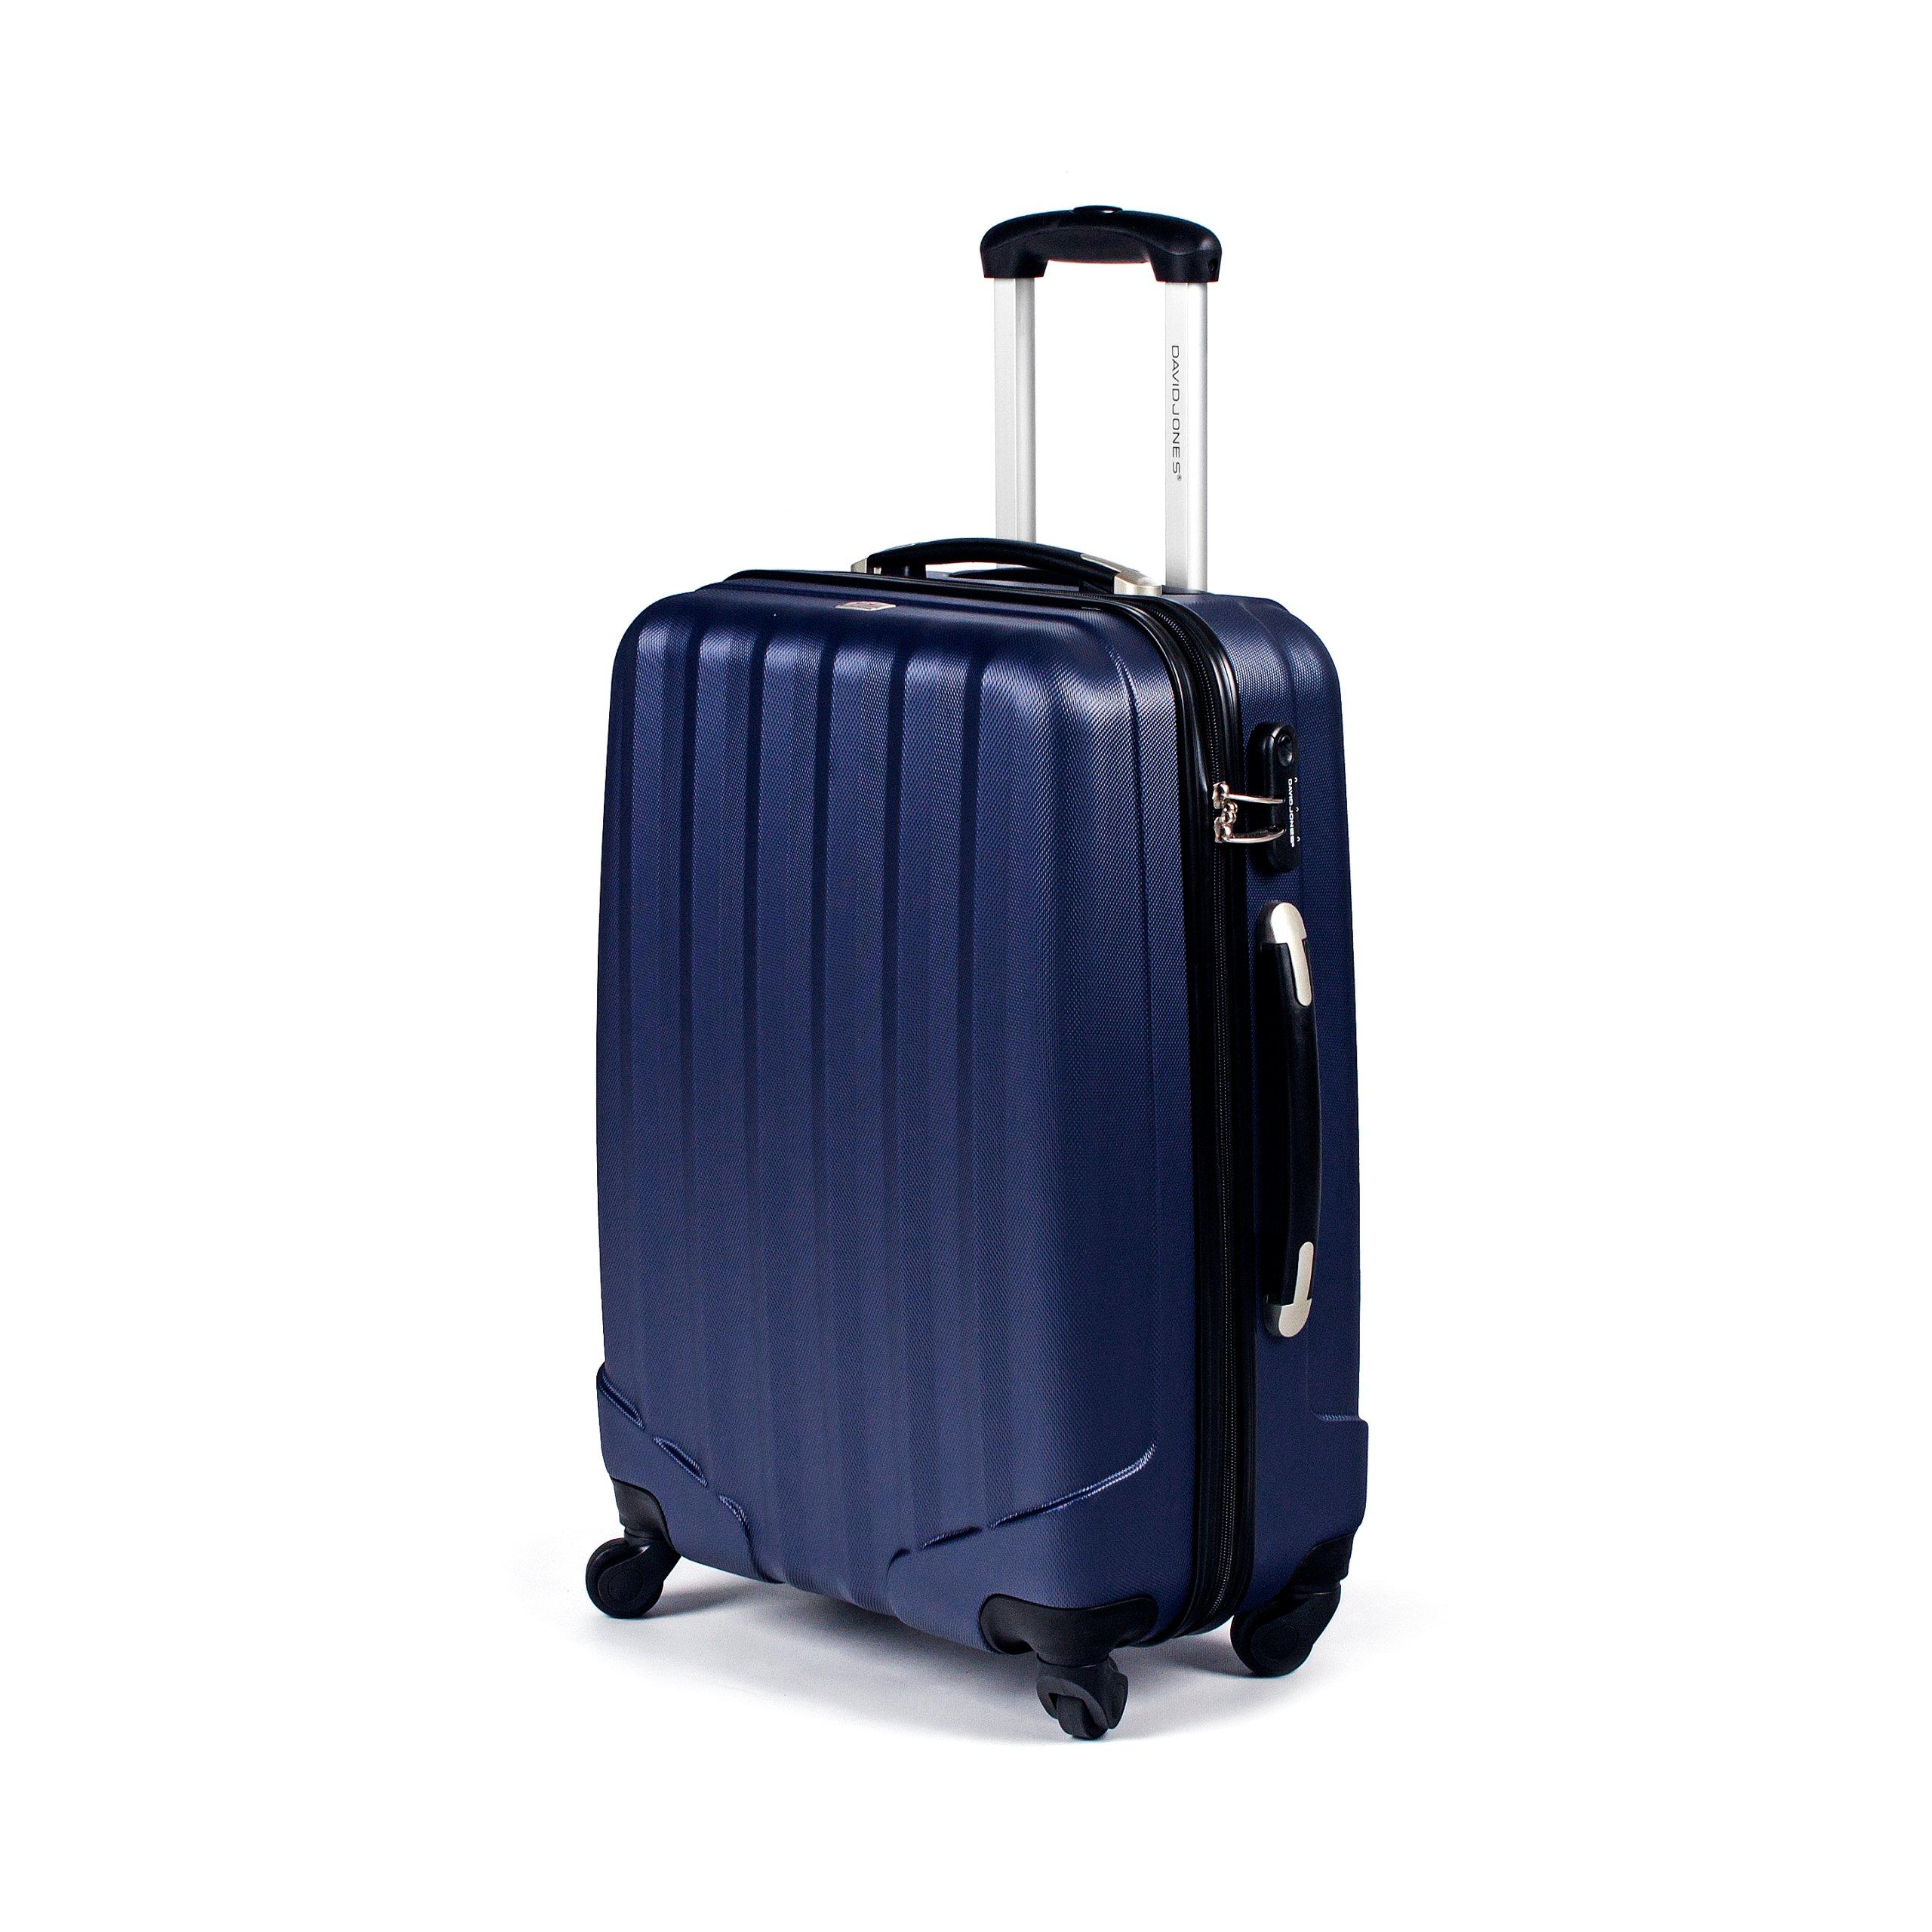 0f62a1e052935 ŚREDNIA walizka DAVID JONES 69L bagaż, kółka - 7090828886 ...